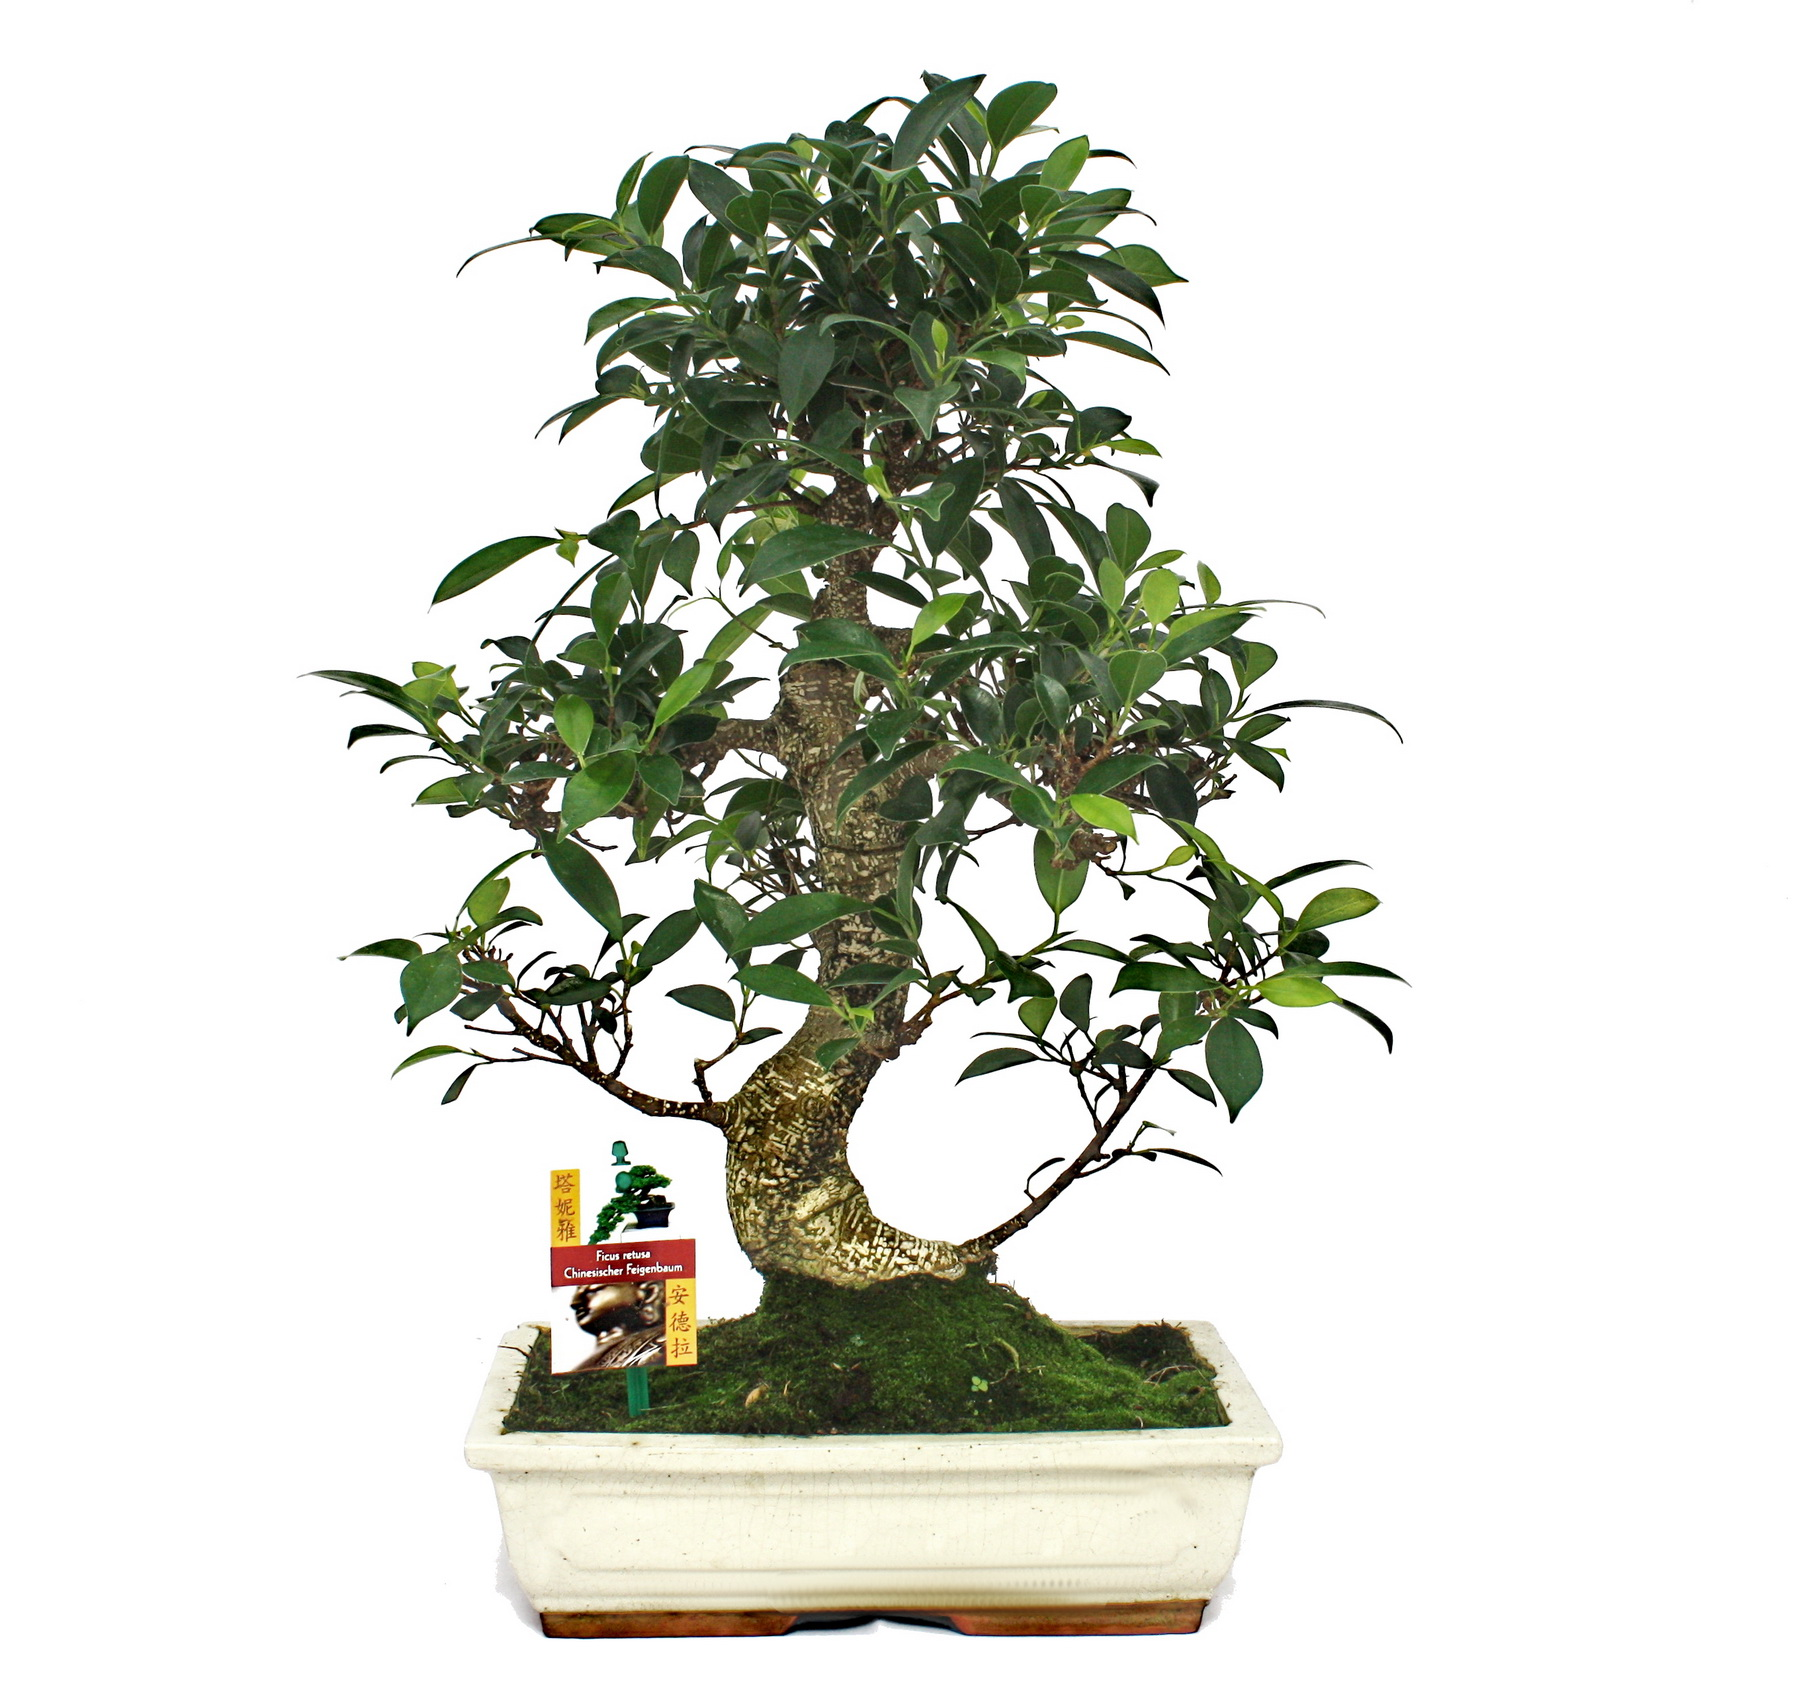 bonsai chinesischer feigenbaum ficus retusa ca 12 15. Black Bedroom Furniture Sets. Home Design Ideas